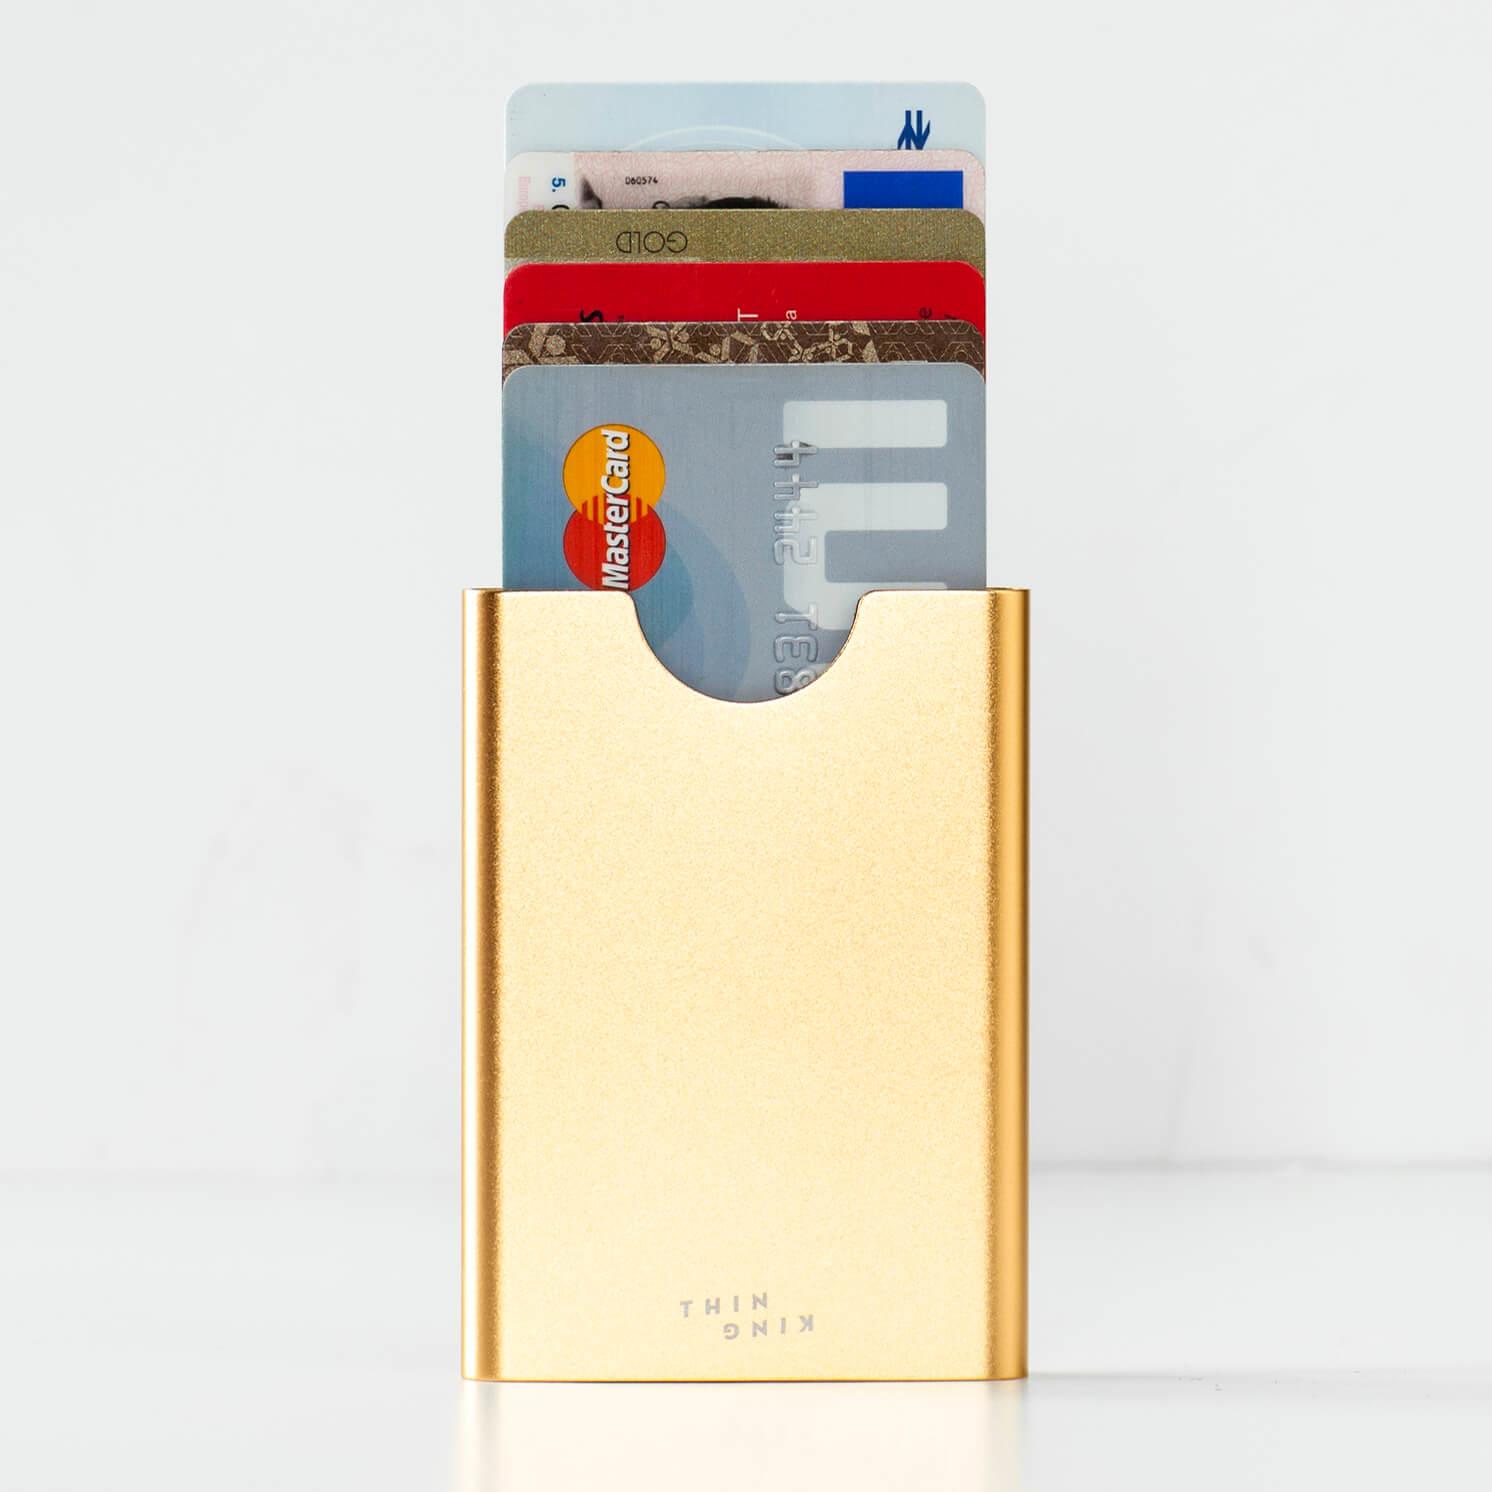 Mince Roi Champagne Cas De Carte Gordito XFGeFybUz